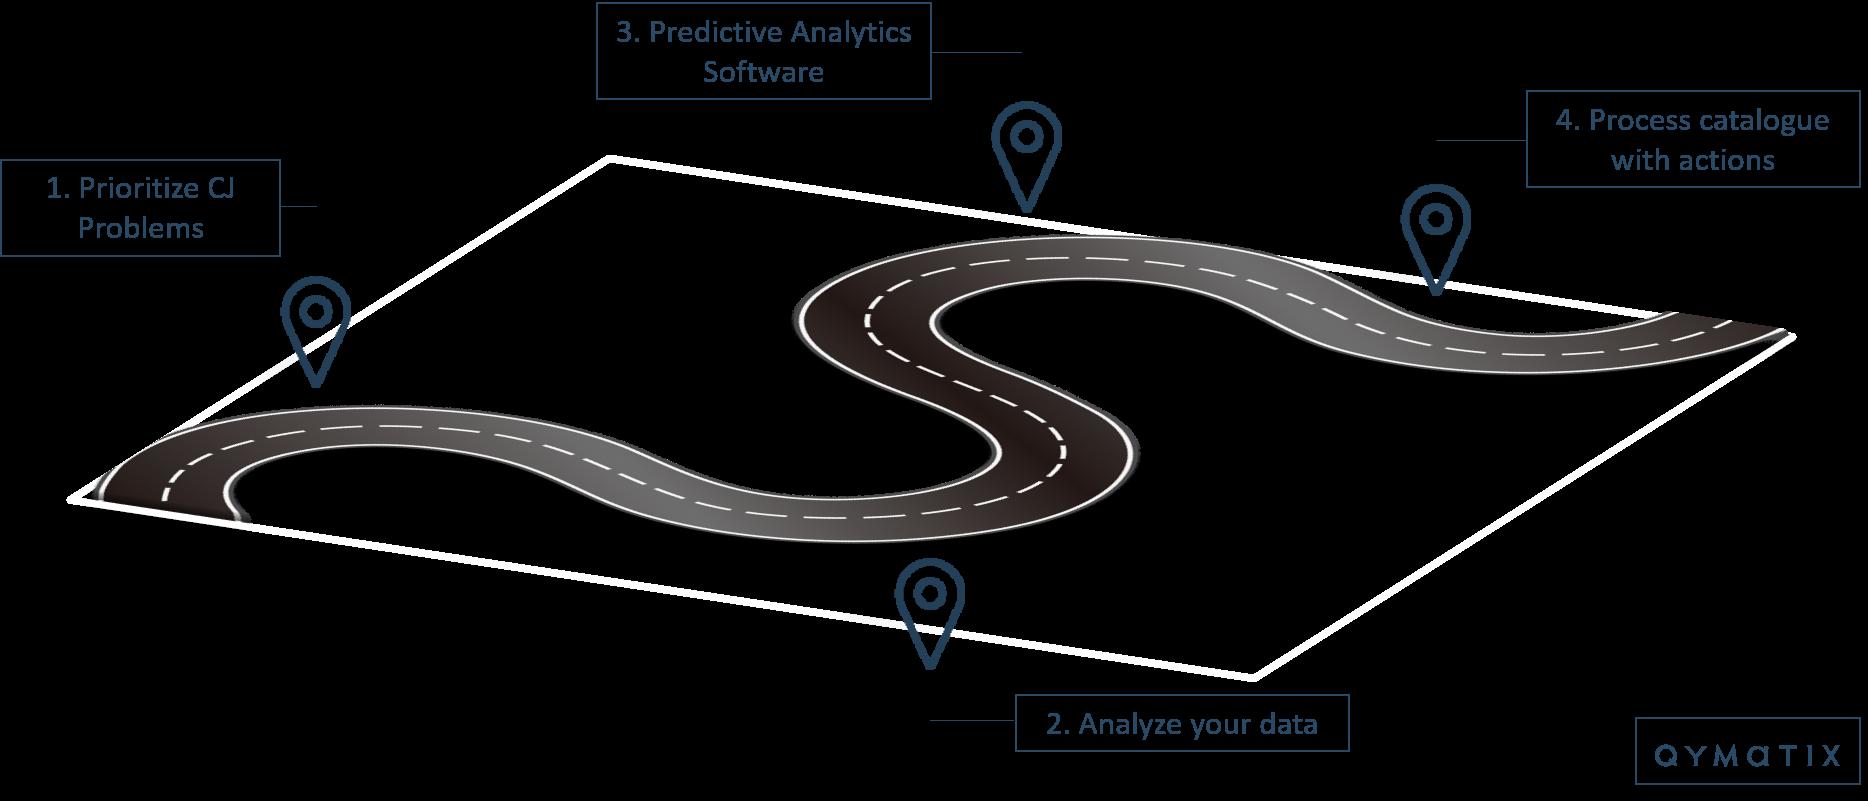 Roadmap for Predictive Analytics in B2B Customer Journeys